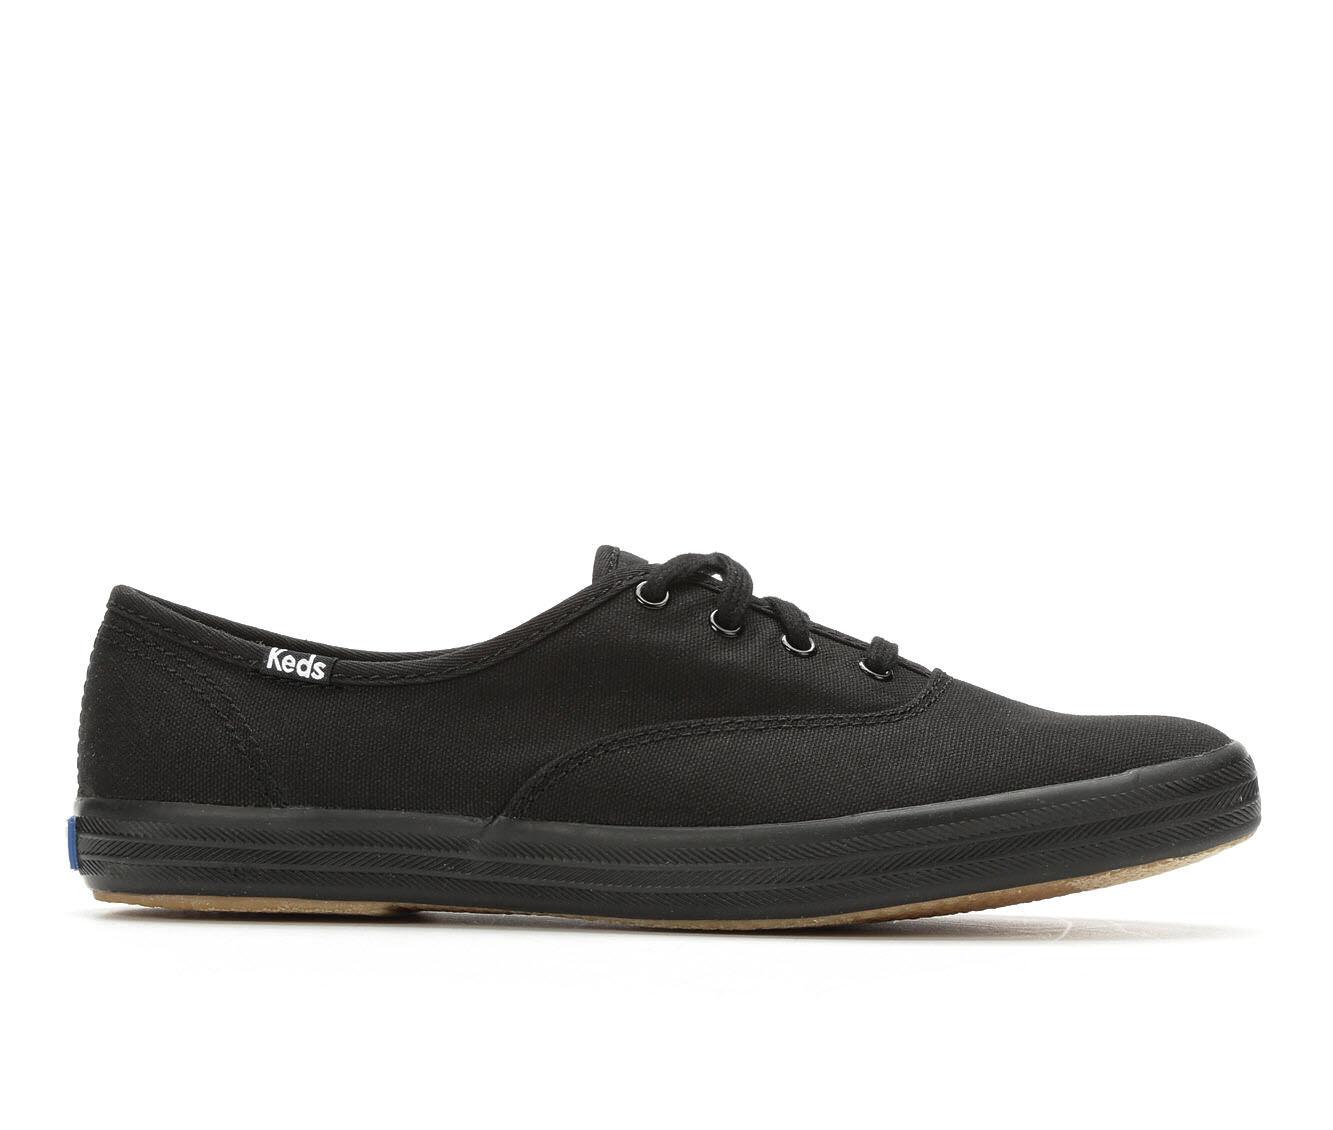 uk shoes_kd4456